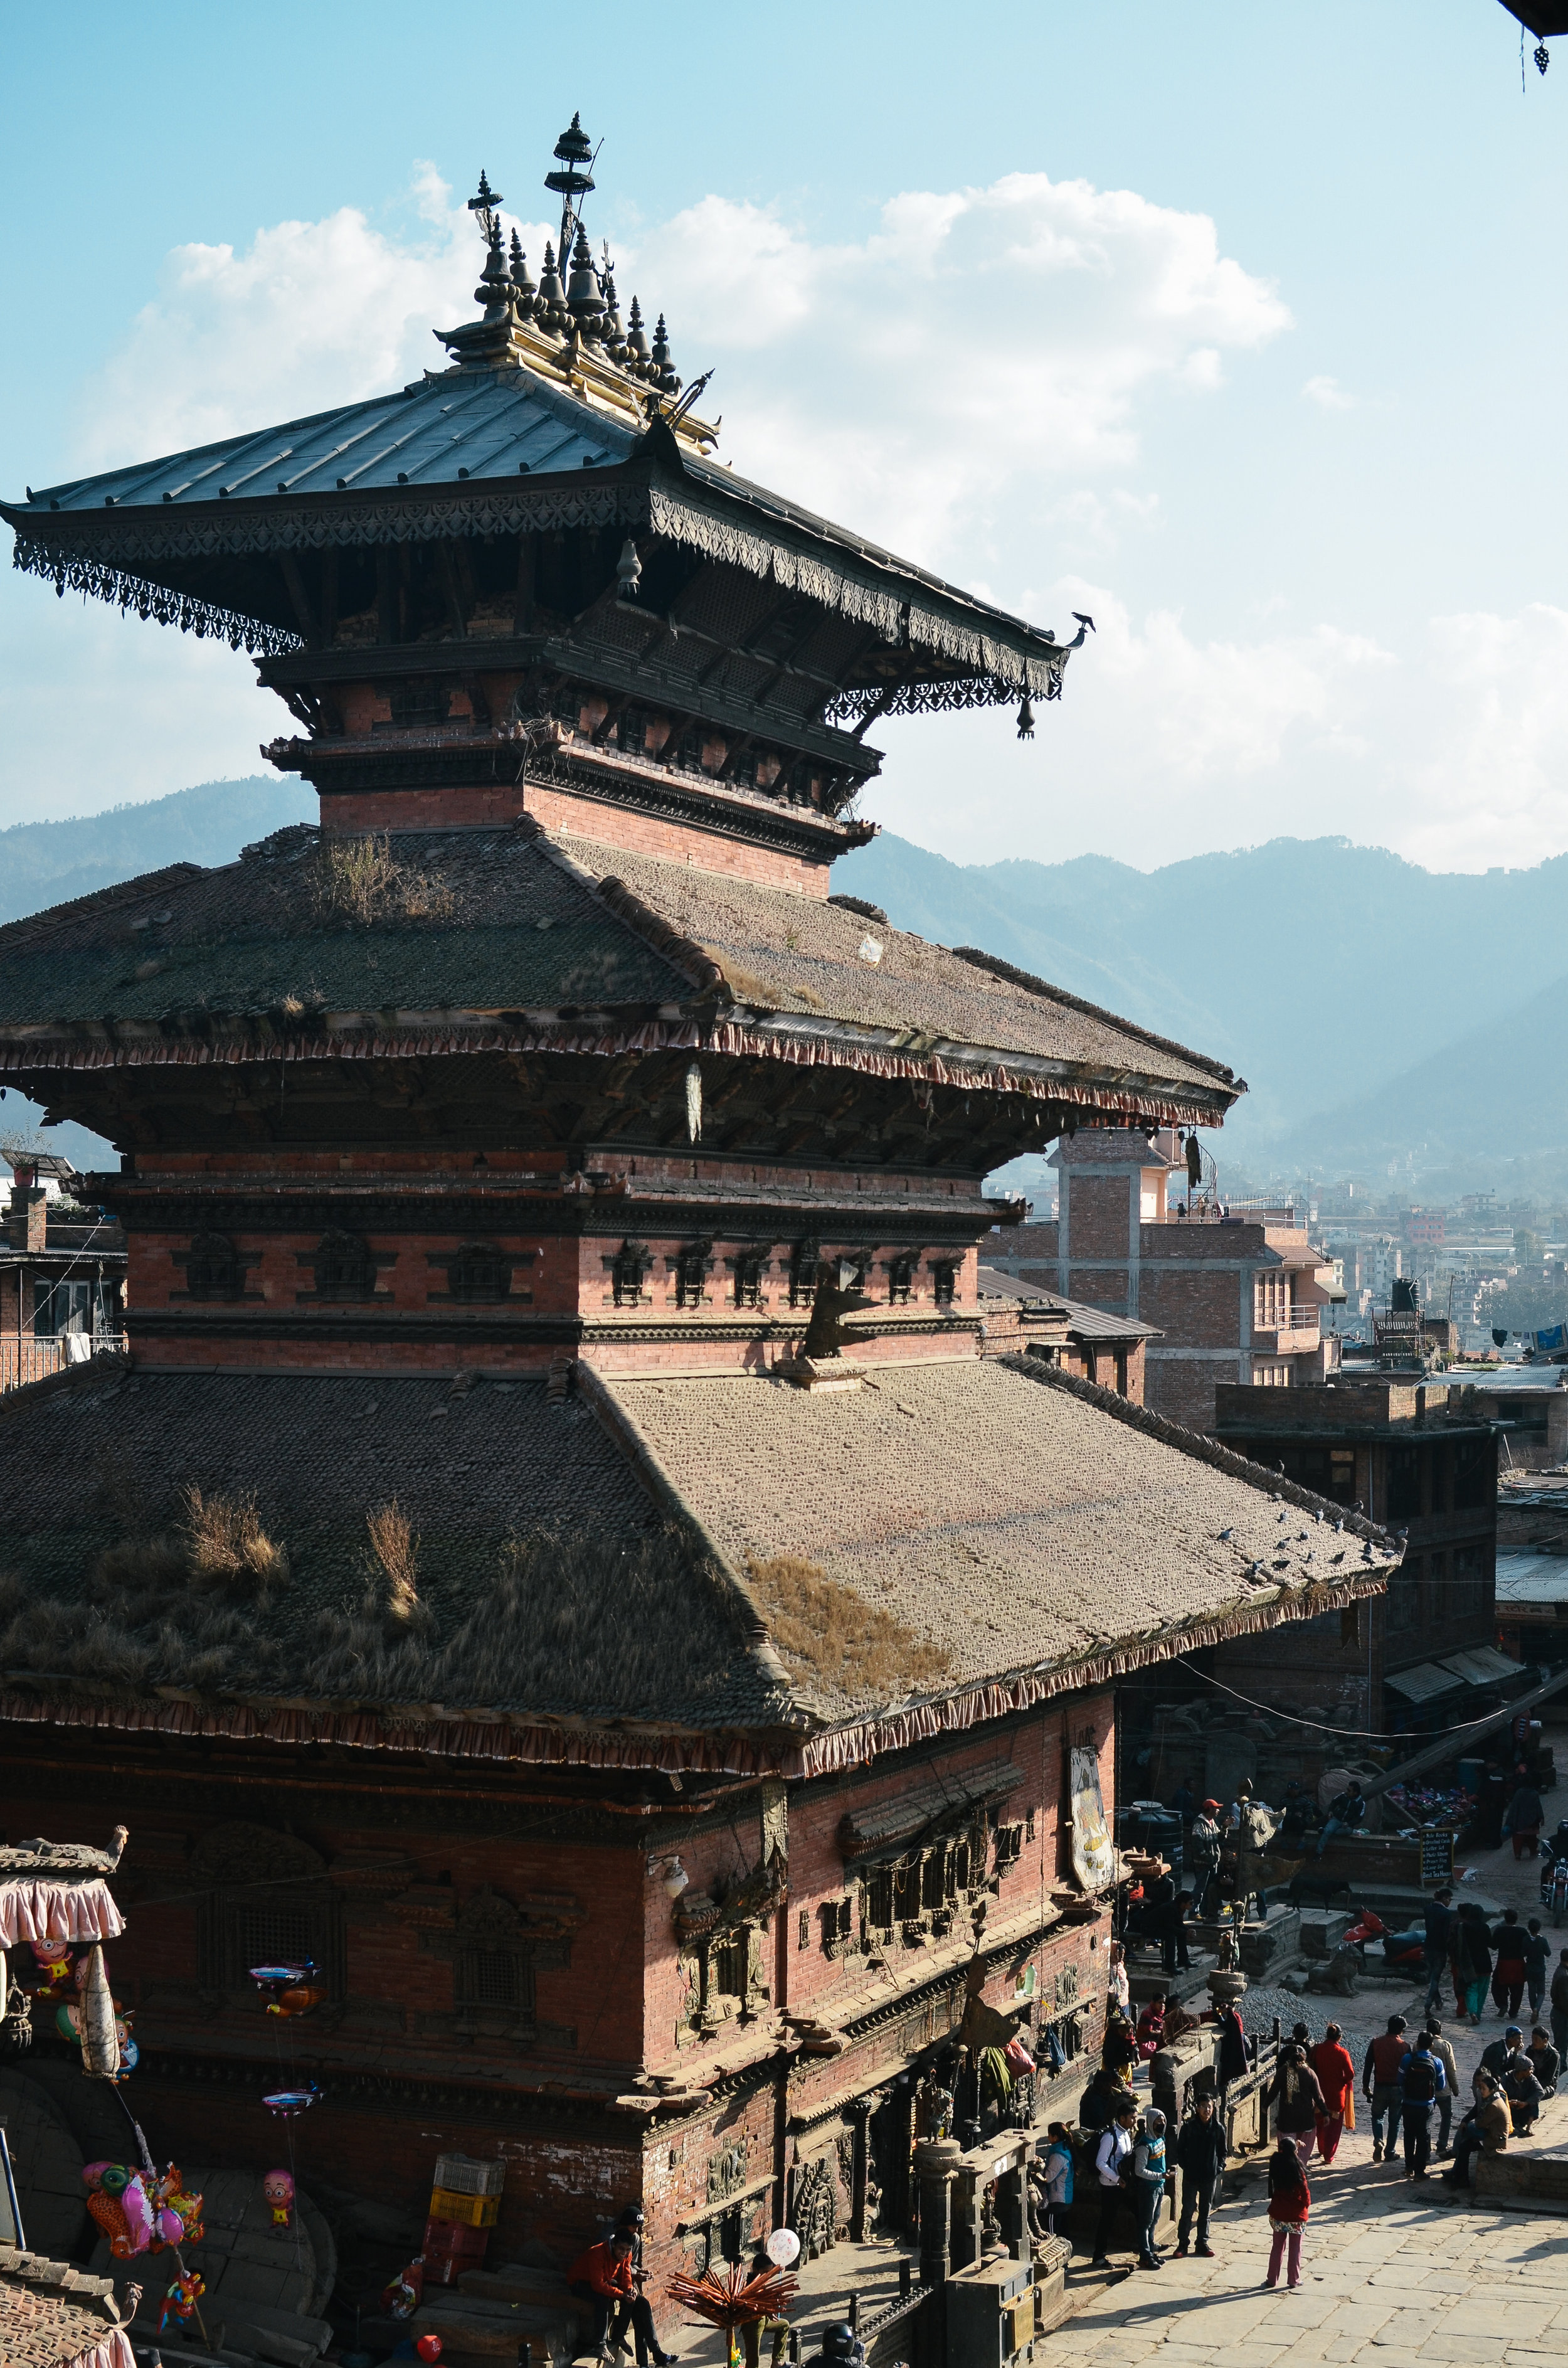 10-things-to-know-kathmandu-nepal-lifeonpine_DSC_0676.jpg